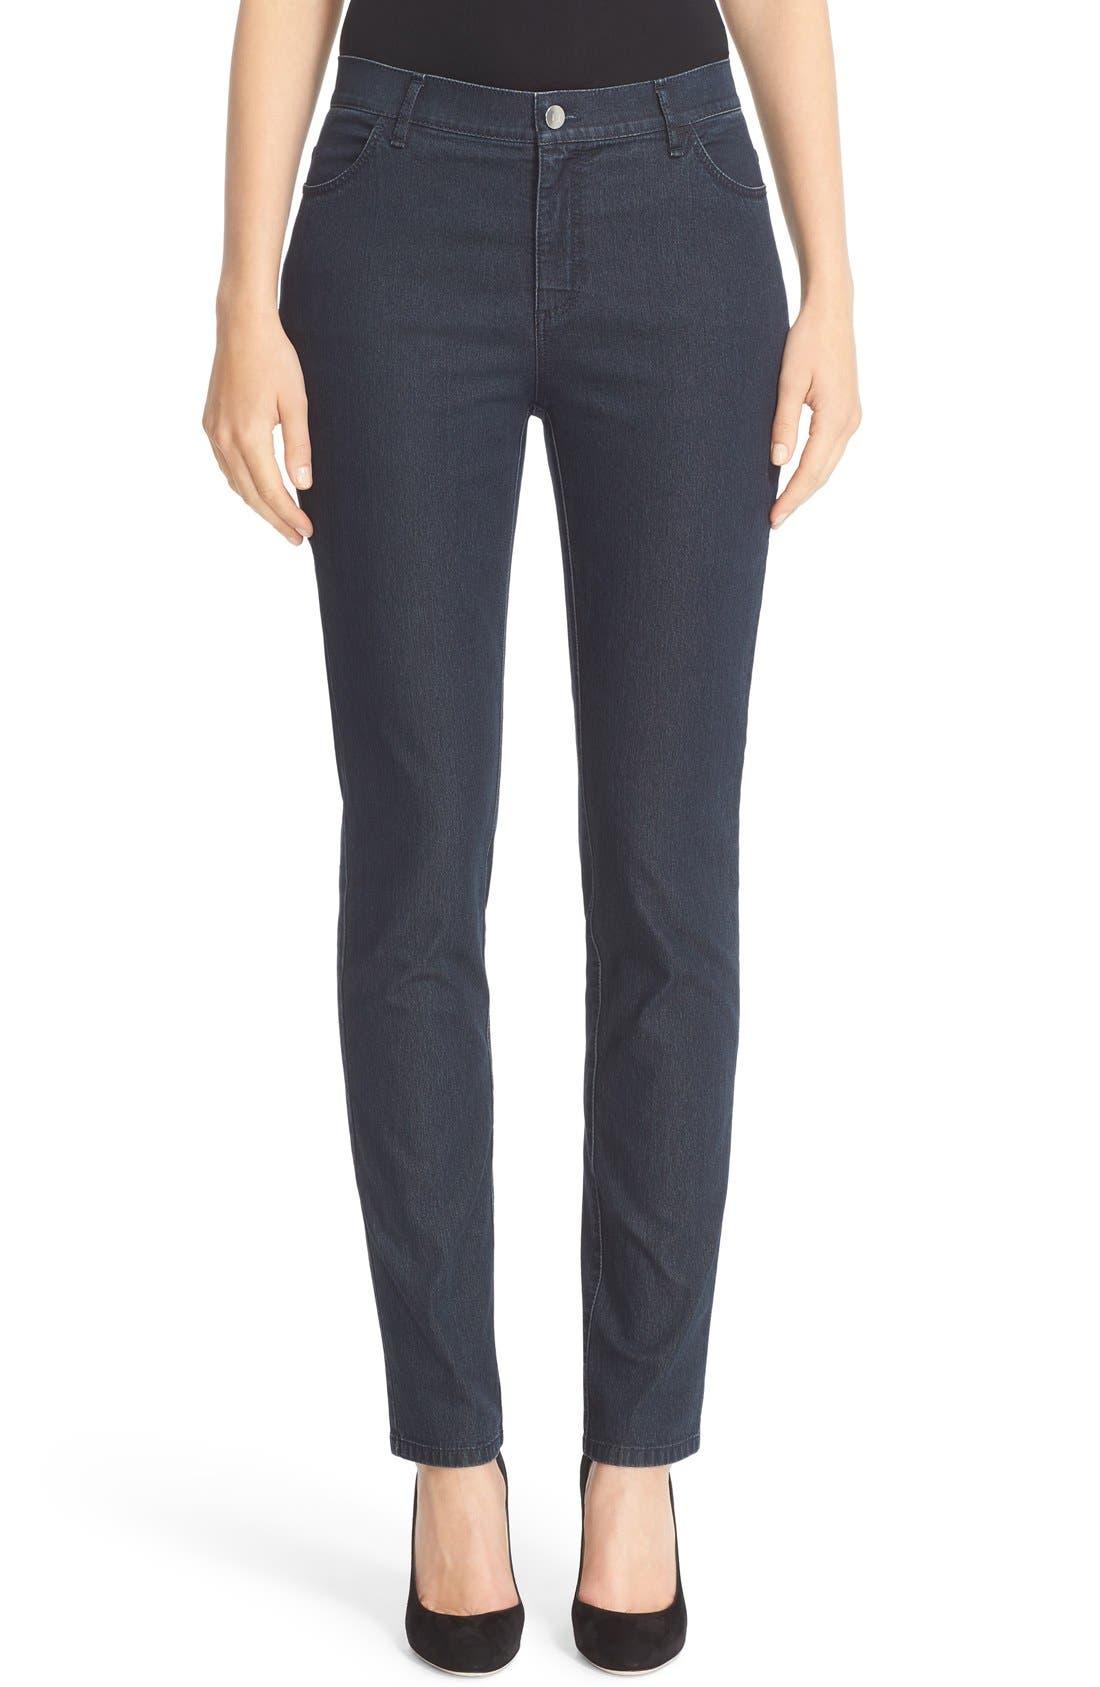 Main Image - Lafayette 148 New York 'Primo Denim' Curvy Fit Slim Leg Jeans